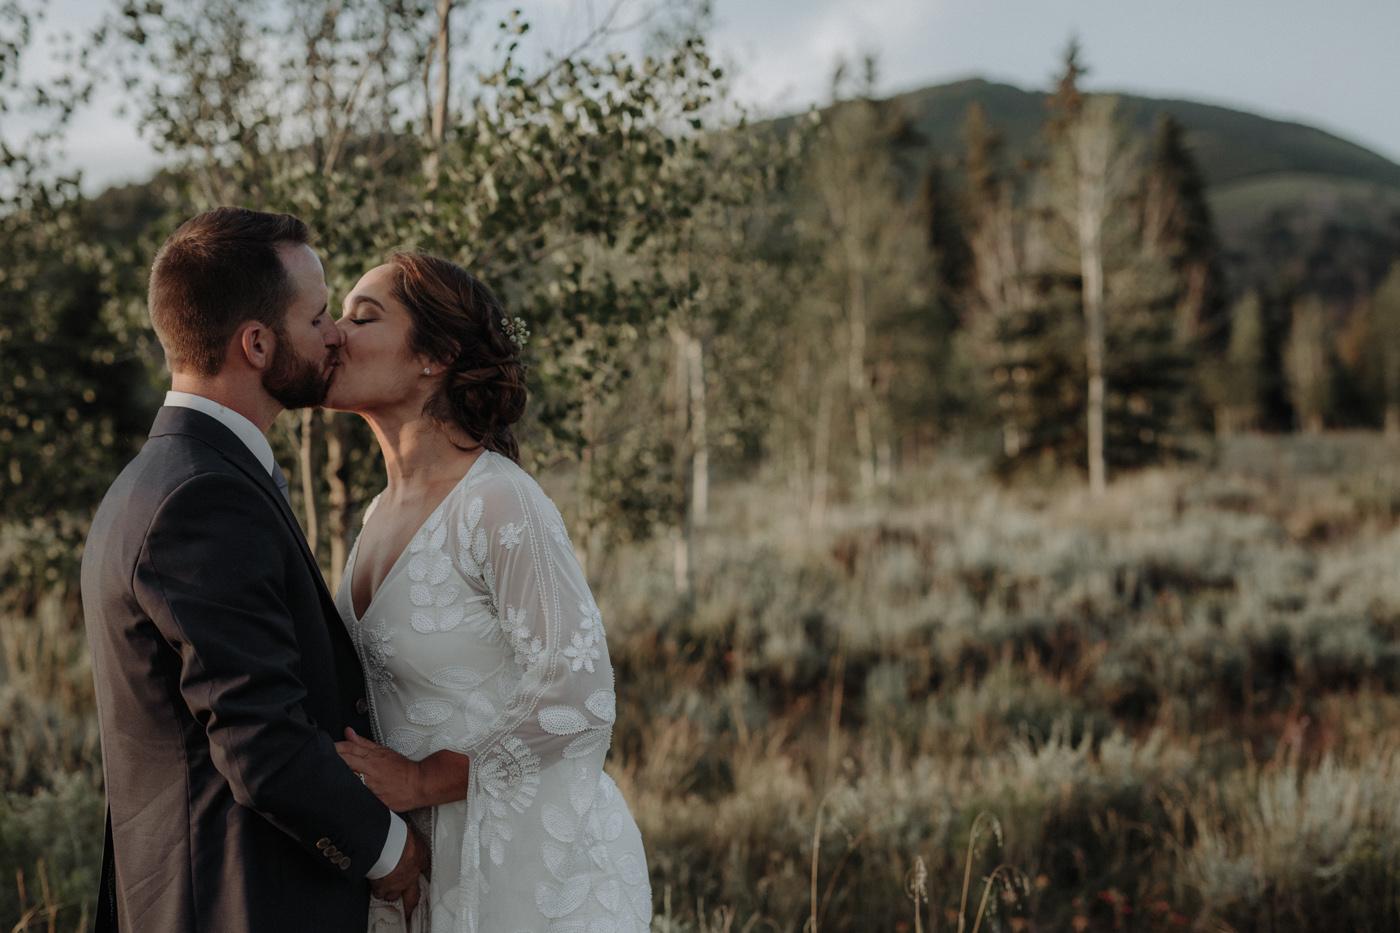 woods-walk-trail-crested-butte-colorado-wedding-127.jpg